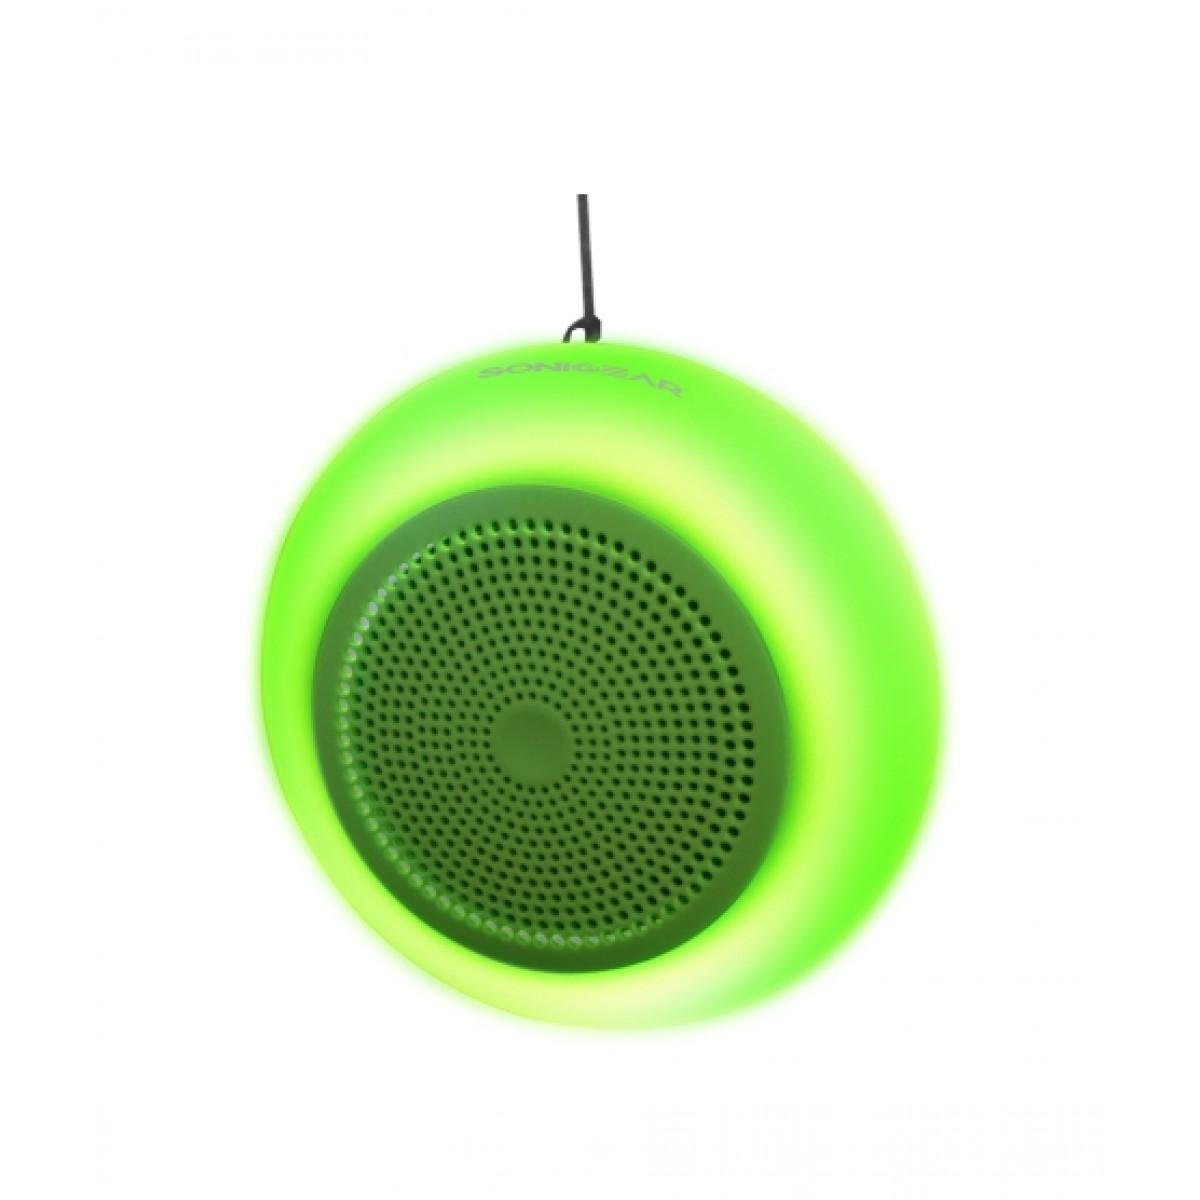 SonicGear Pandora Lumo 2 Bluetooth Wireless Speakers Green